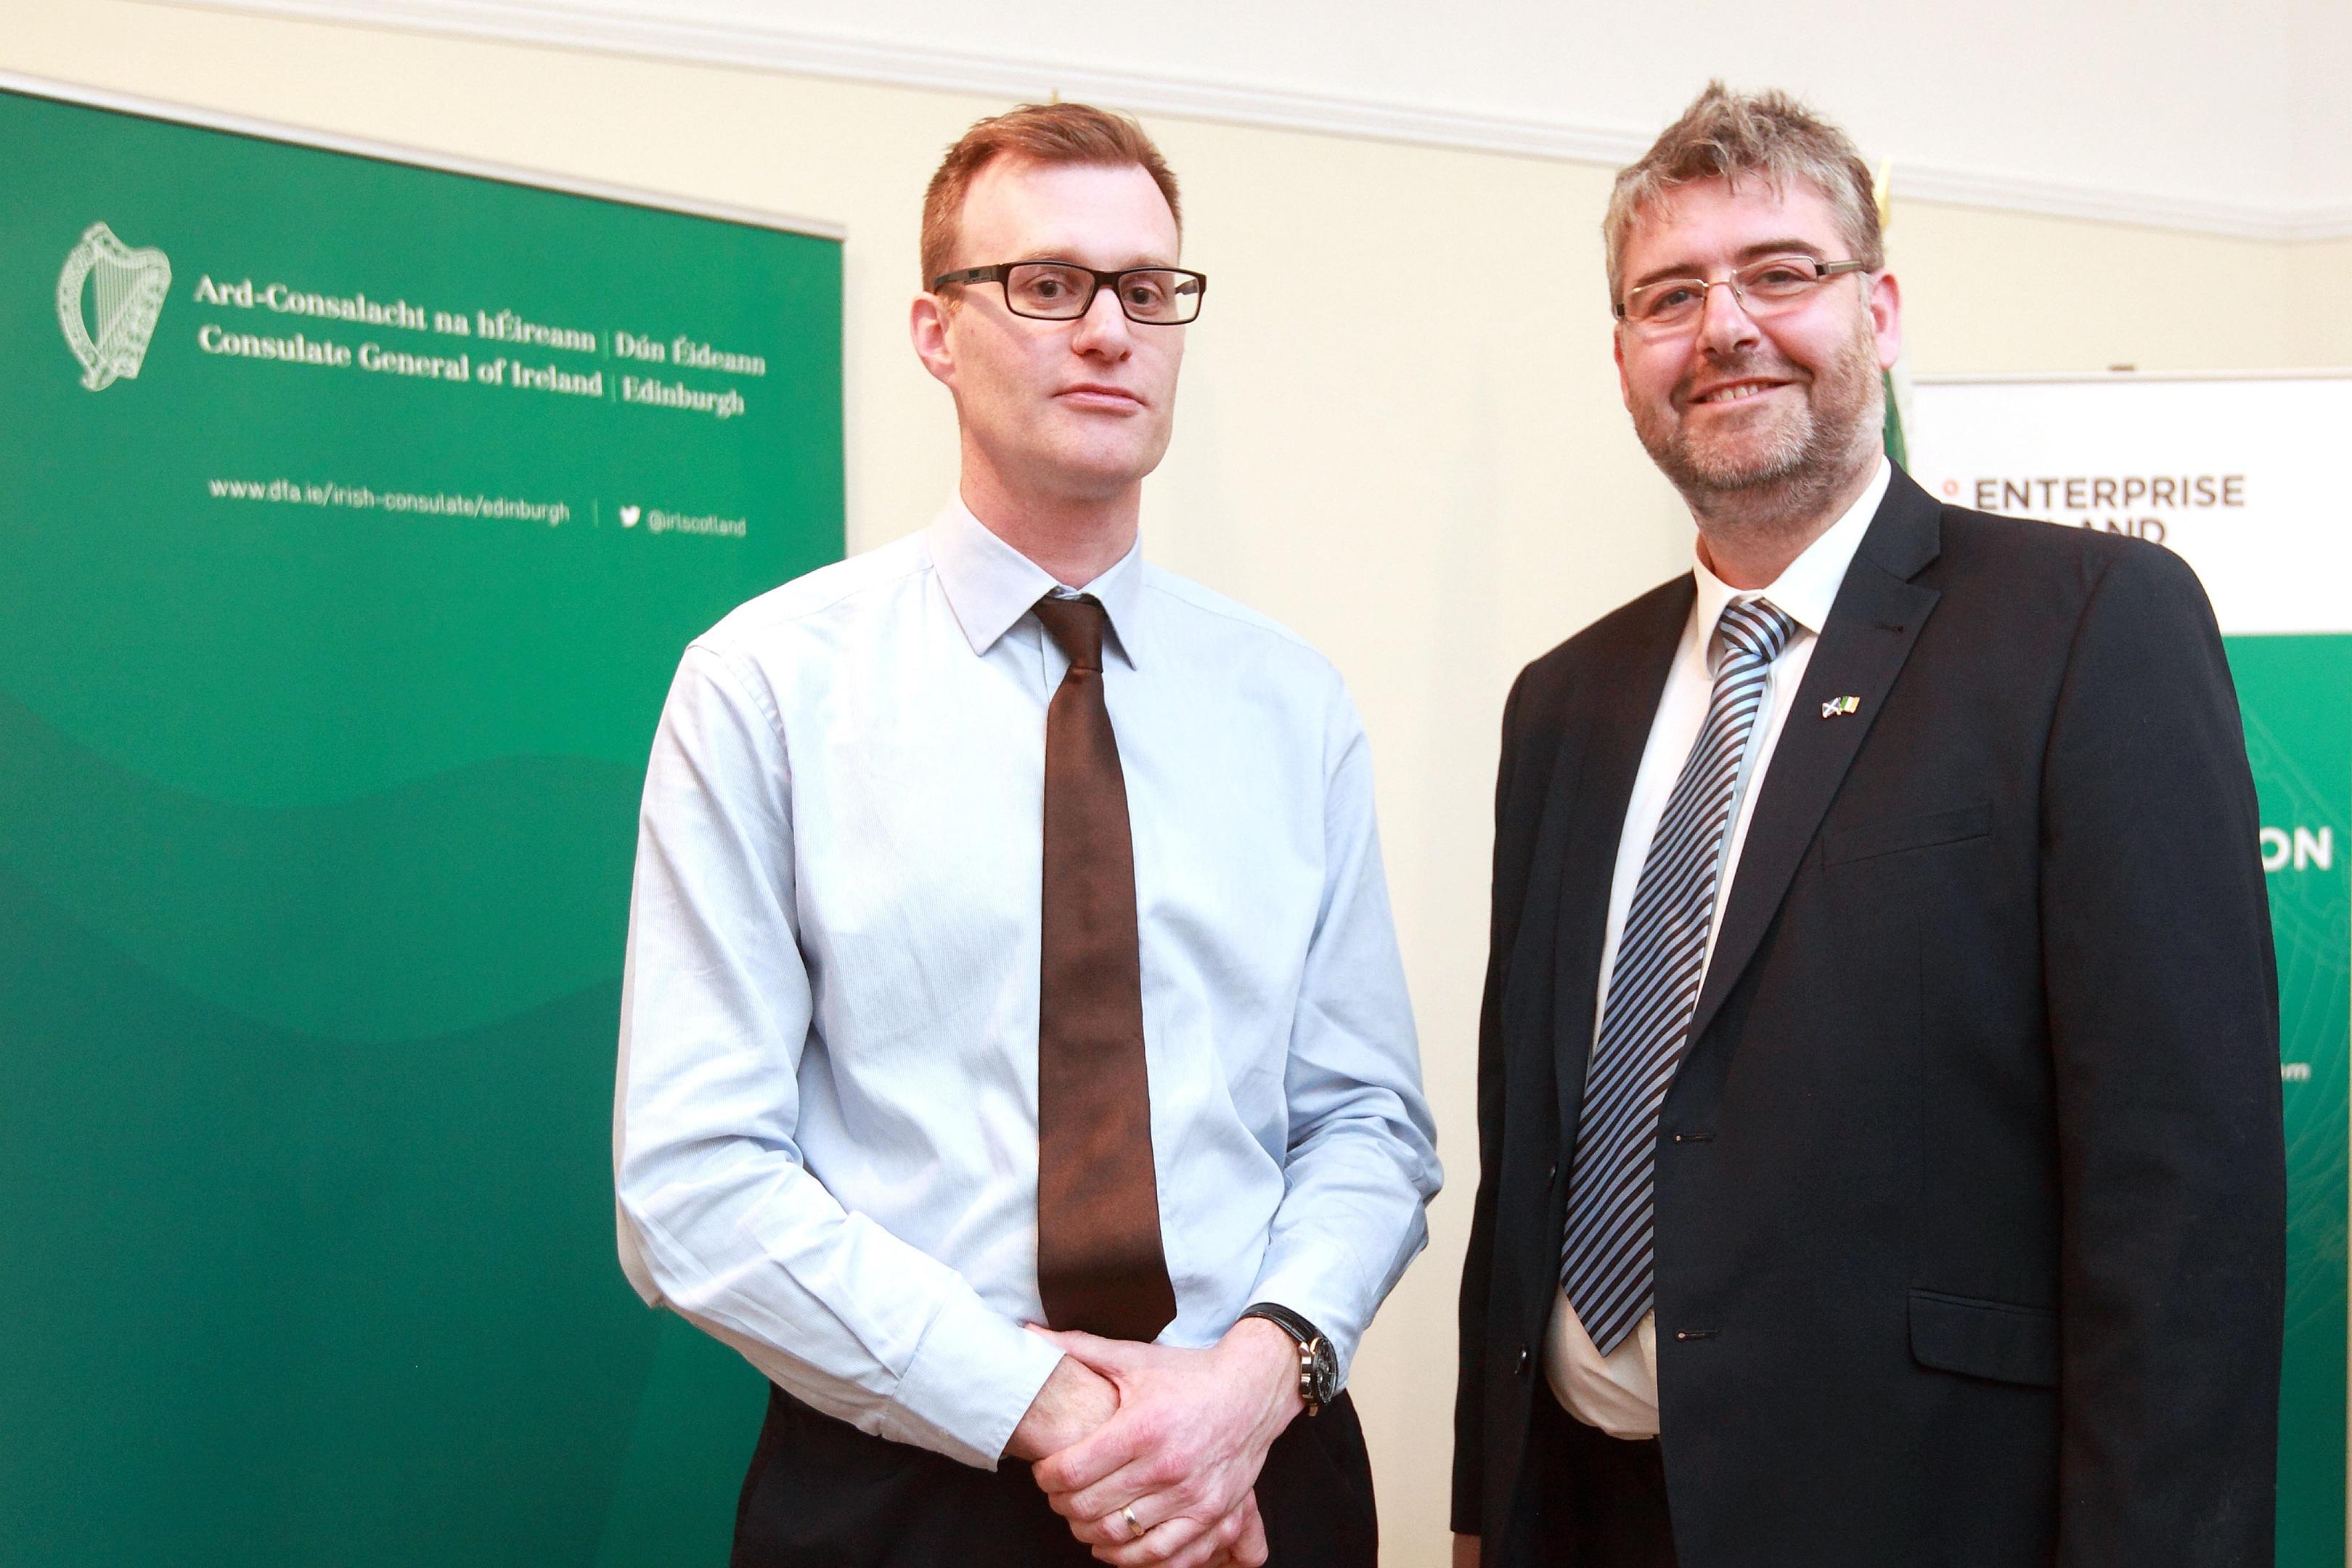 Alan Keogh (left) and Gordon Robertson